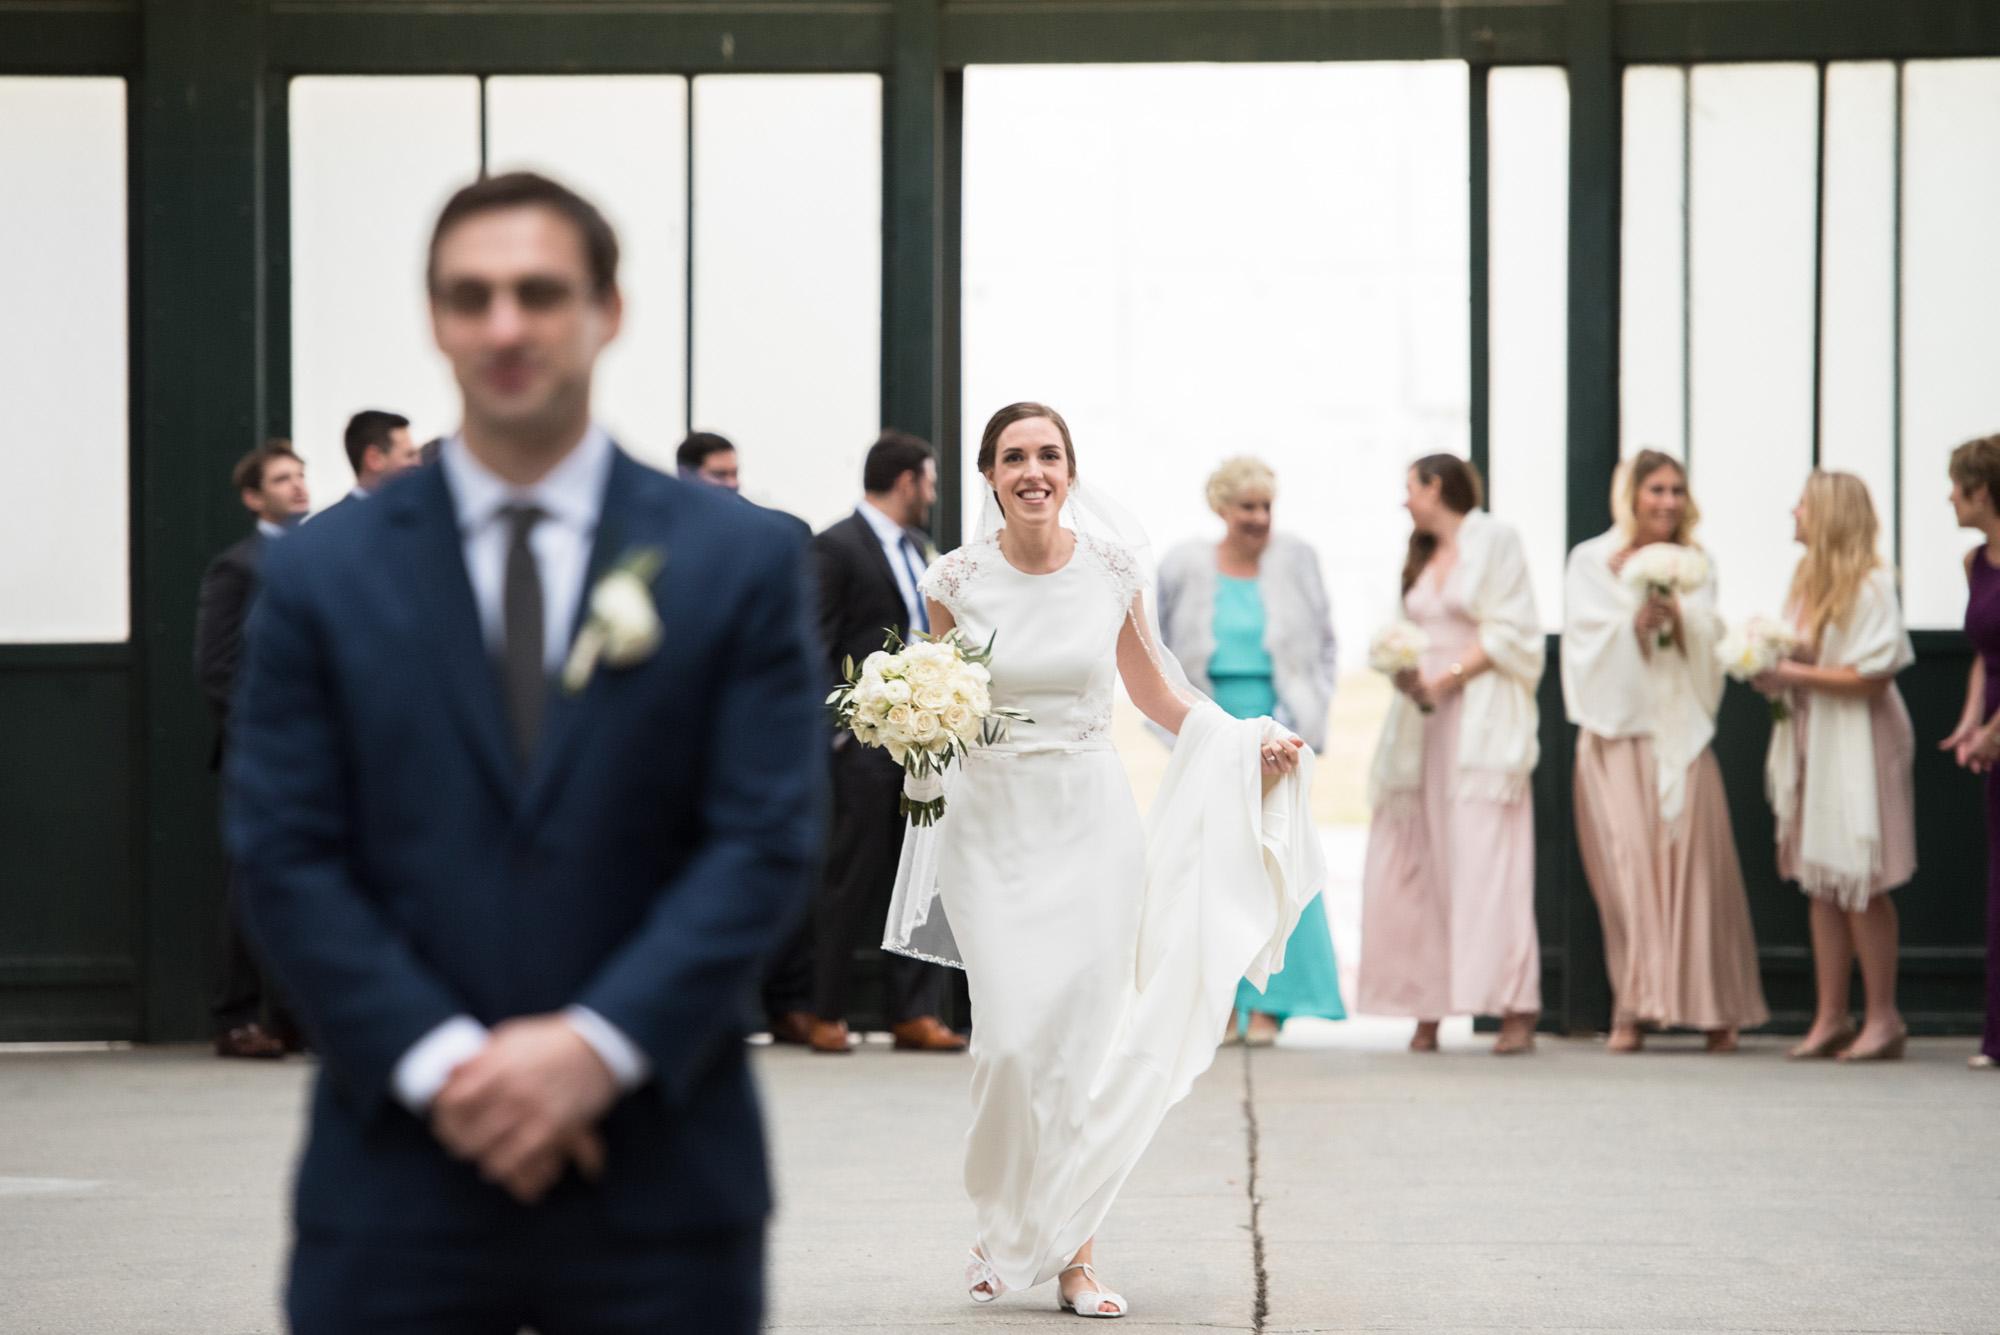 nj-wedding-photographer-maritime-parc-maria-david-16.jpg